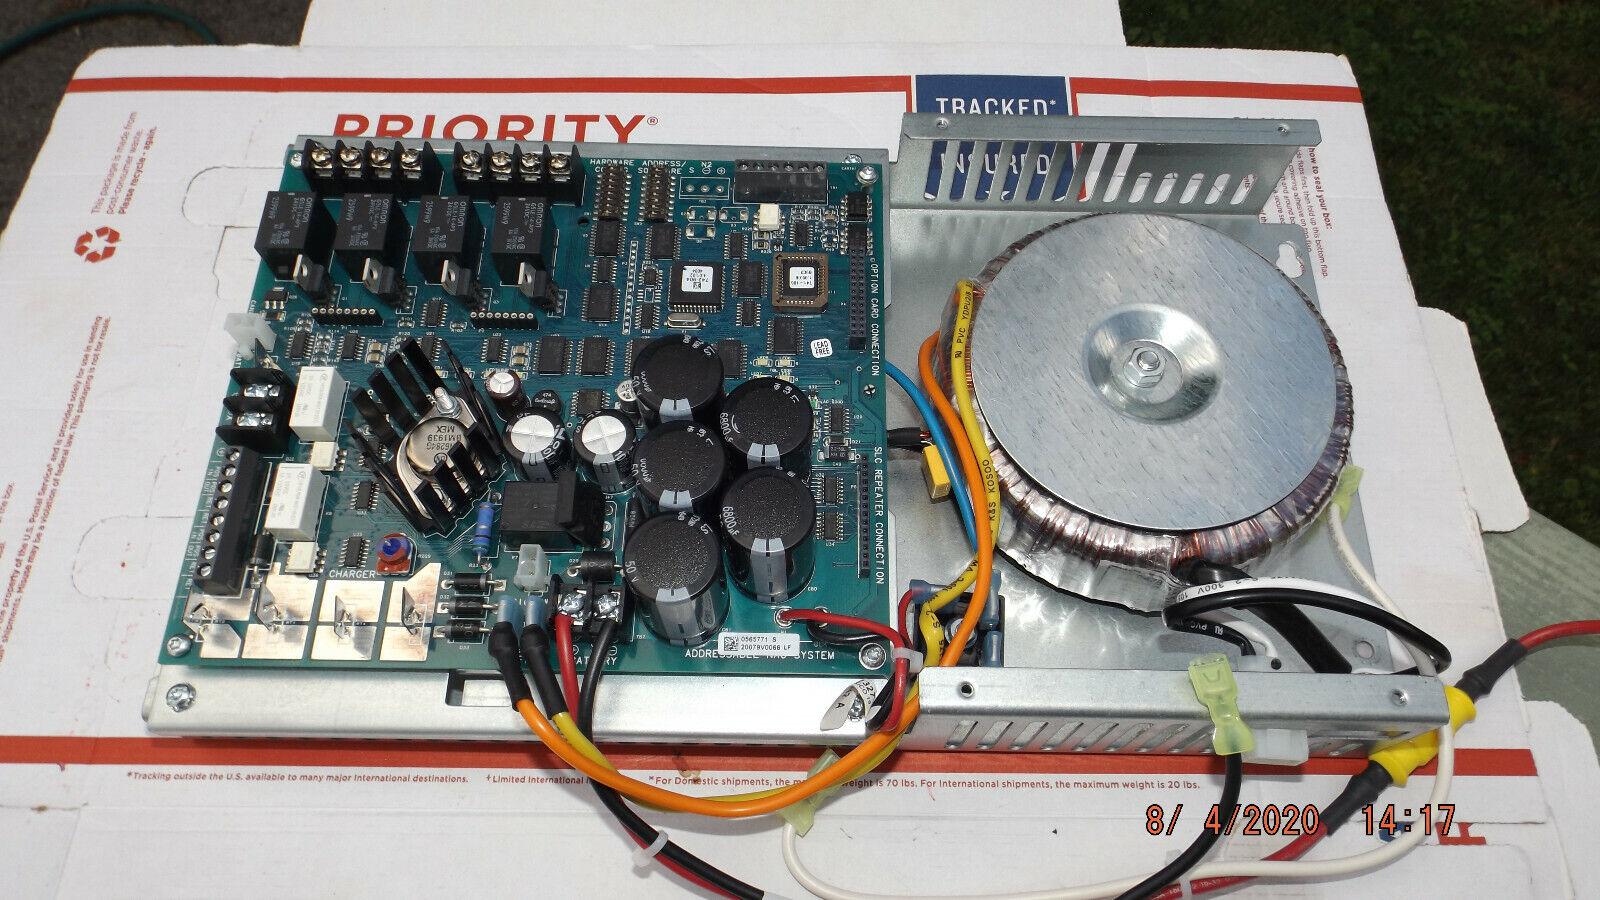 Simplex 4009-9001 Nac Power Extender 7 Available.